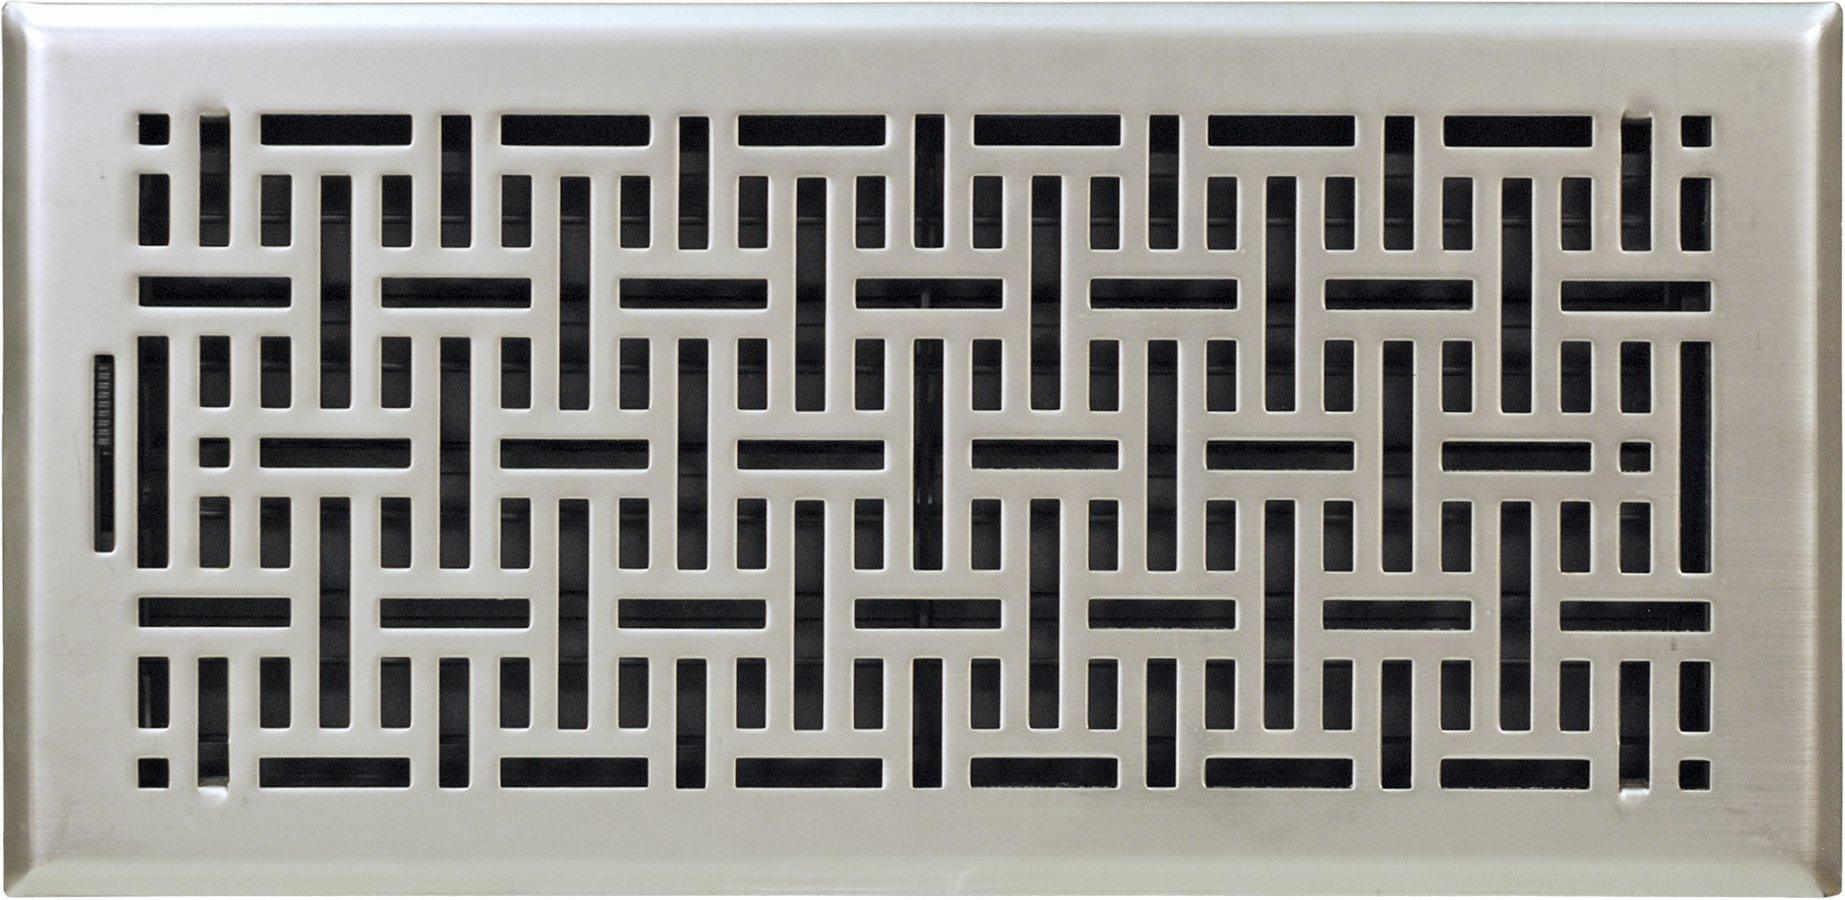 Accord Ventilation AMFRSNB614 Wicker Design Floor Register, Satin Nickel, 6'' x 14'', Silver